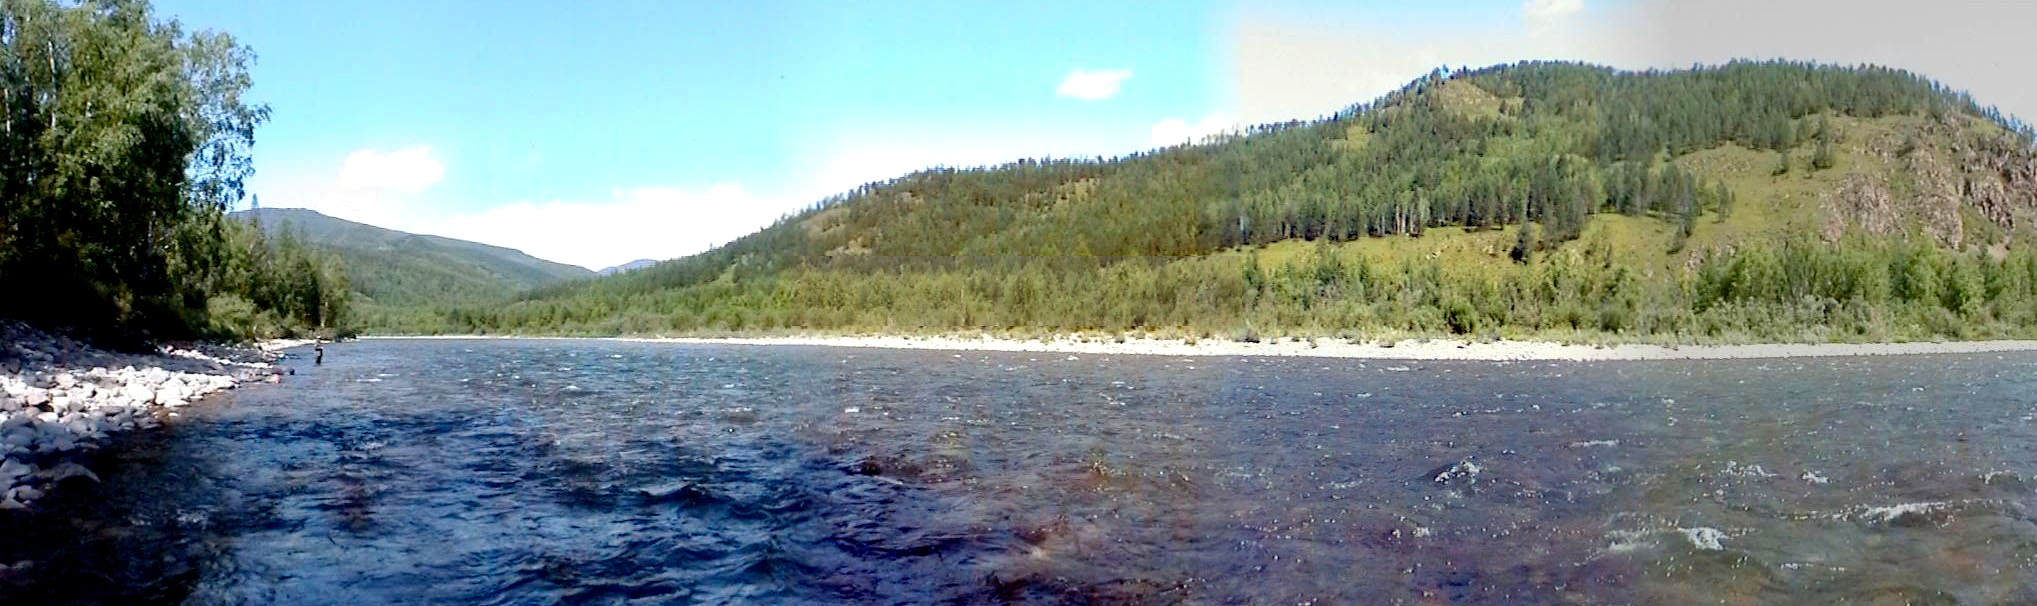 Река уса фото 7